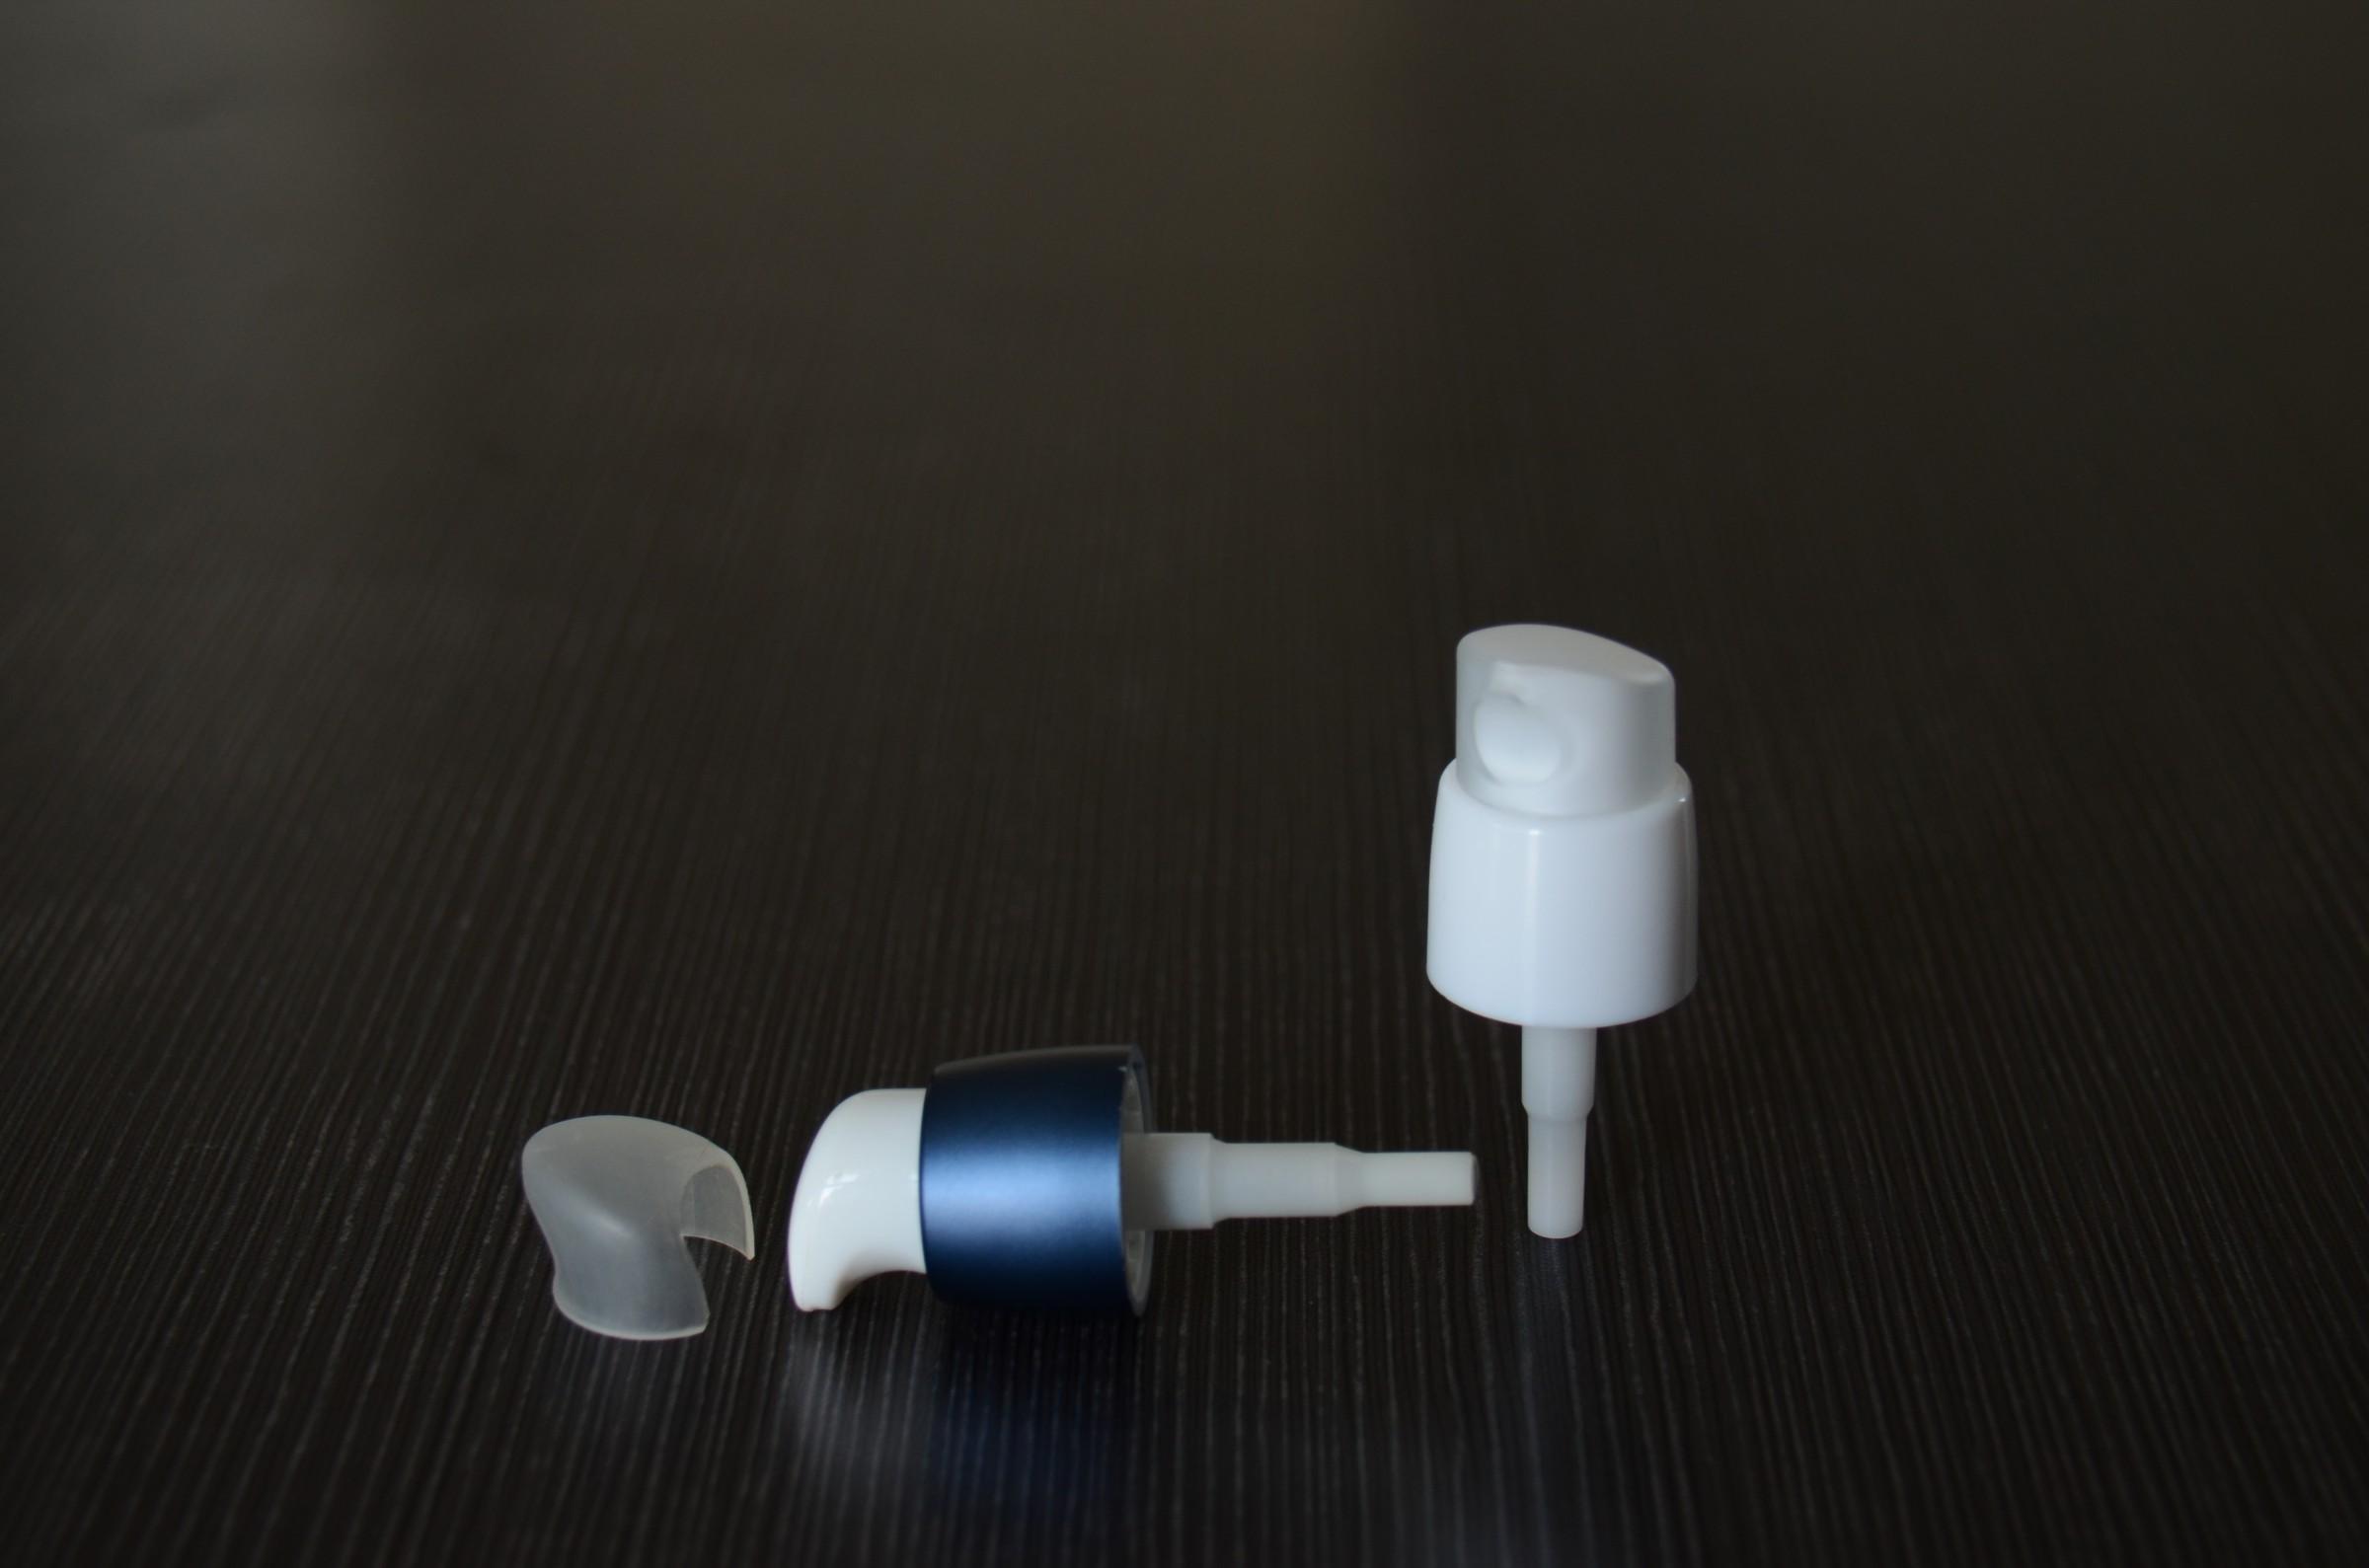 Aluminum treatment pump dispenser